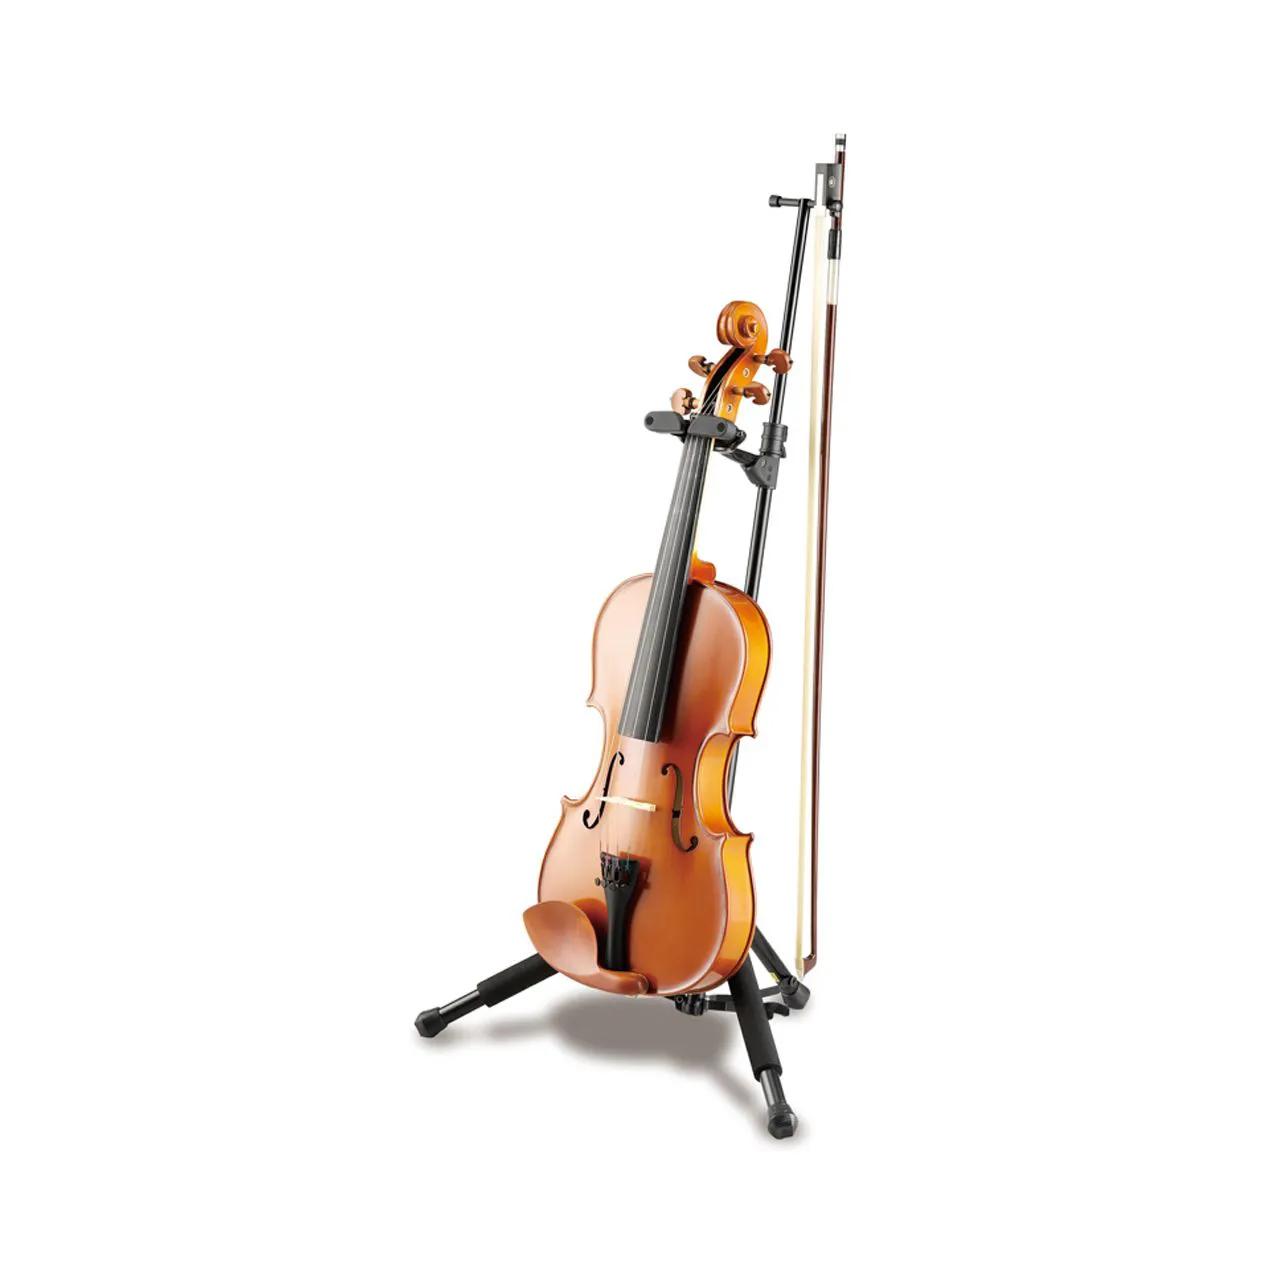 Suporte Travlite Aluminio P/violino/viola Ds571bb Hercules